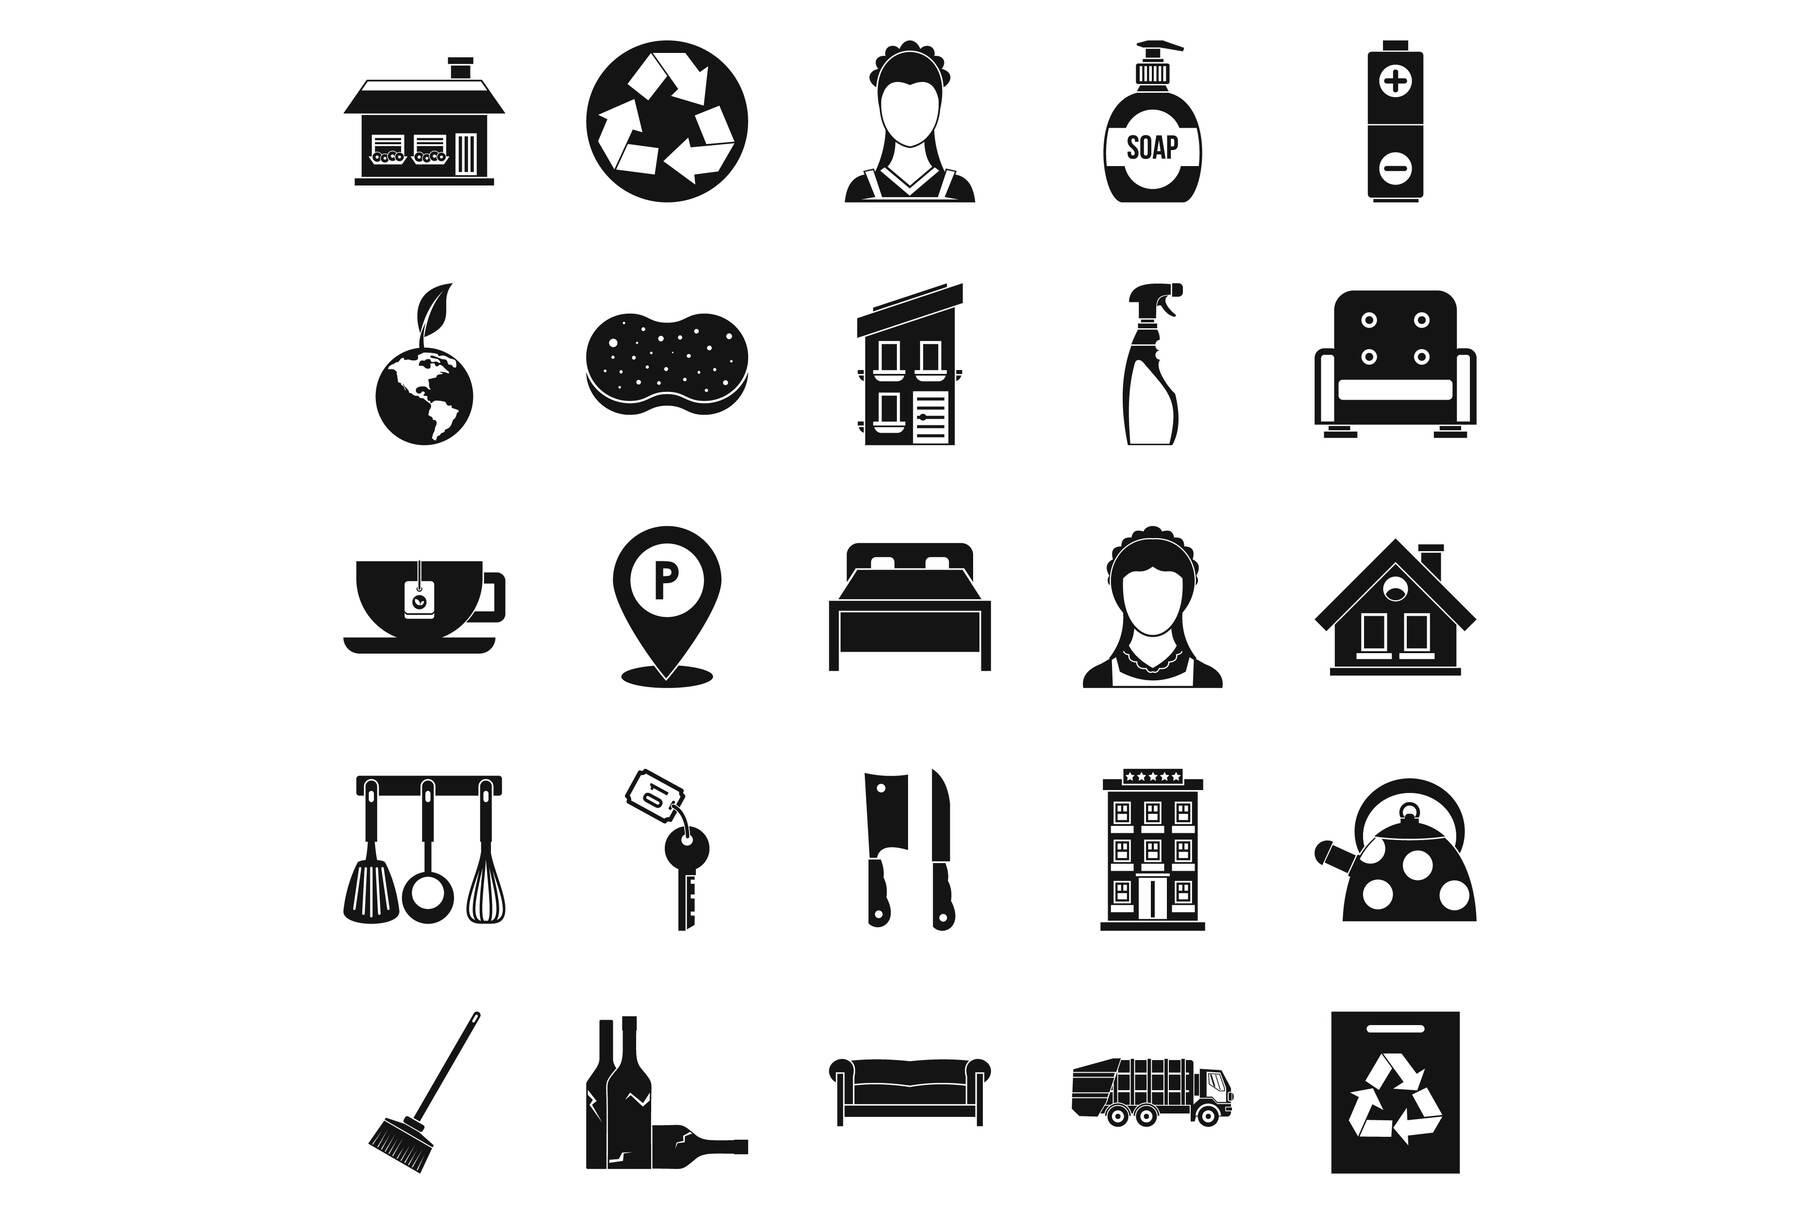 Purification icons set, simple style example image 1